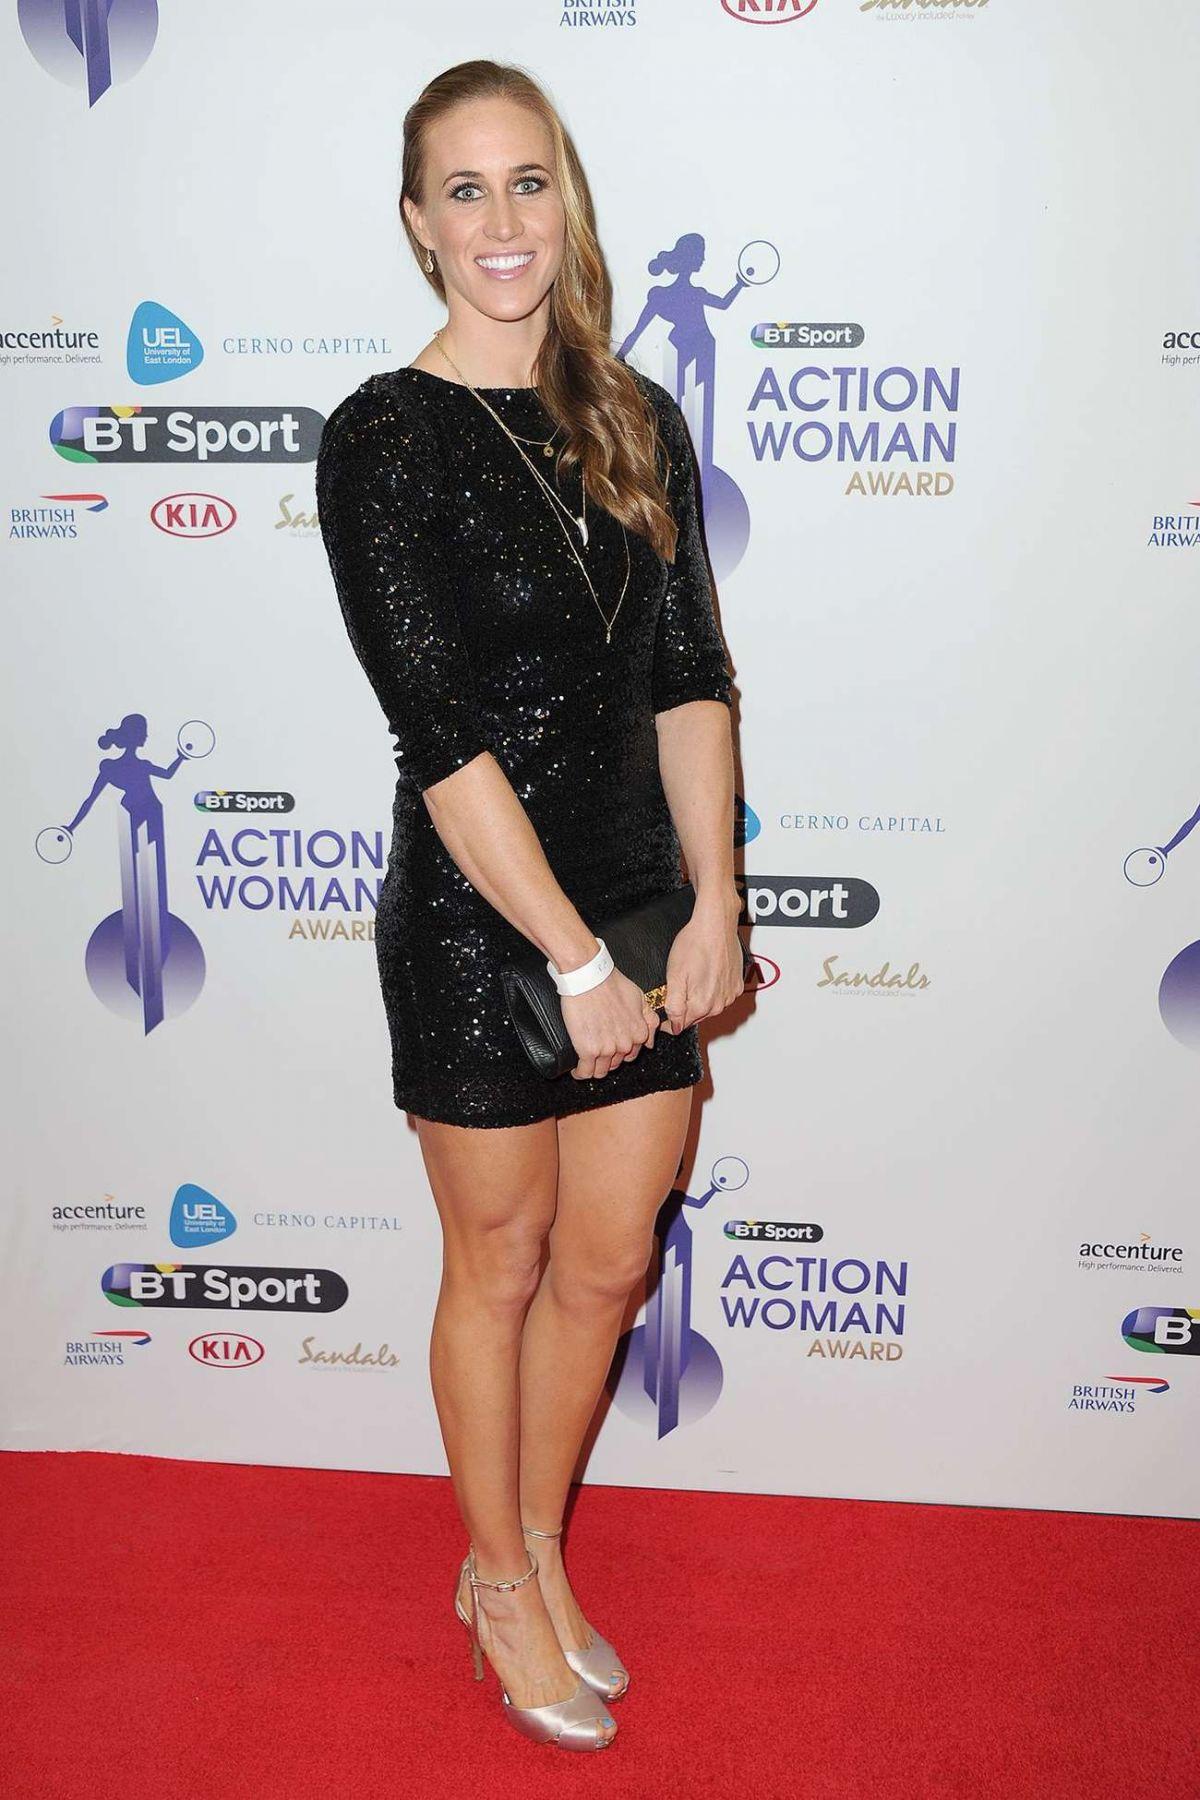 HELEN GLOVER at BT Sport Action Woman Awards